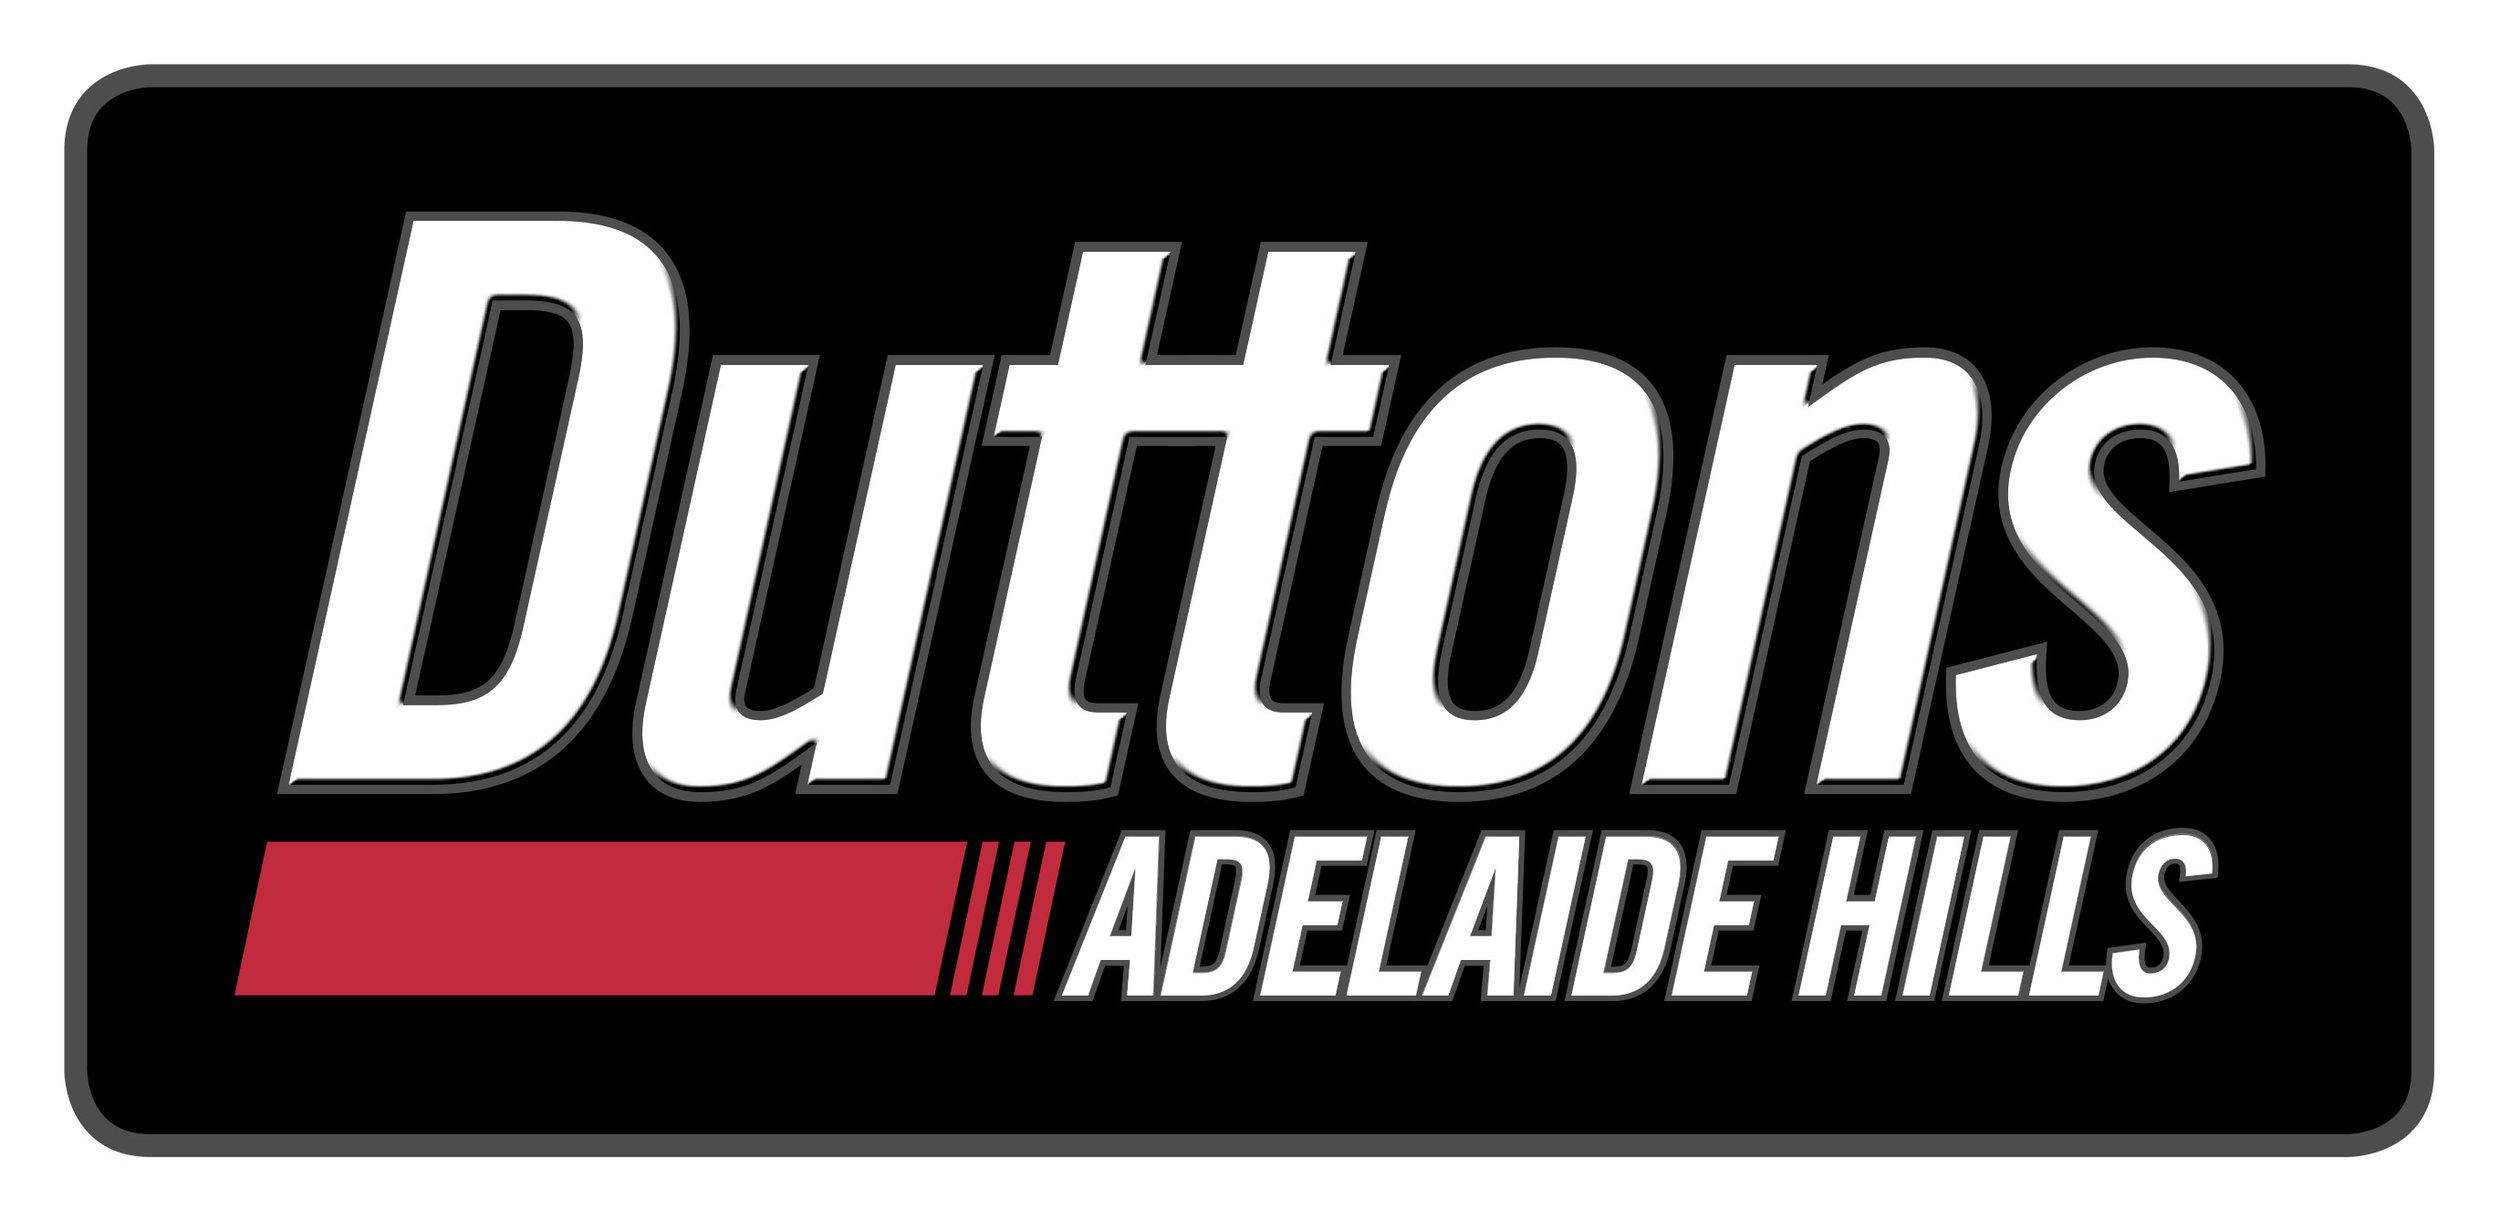 Duttons-Adelaide-Hills.jpg